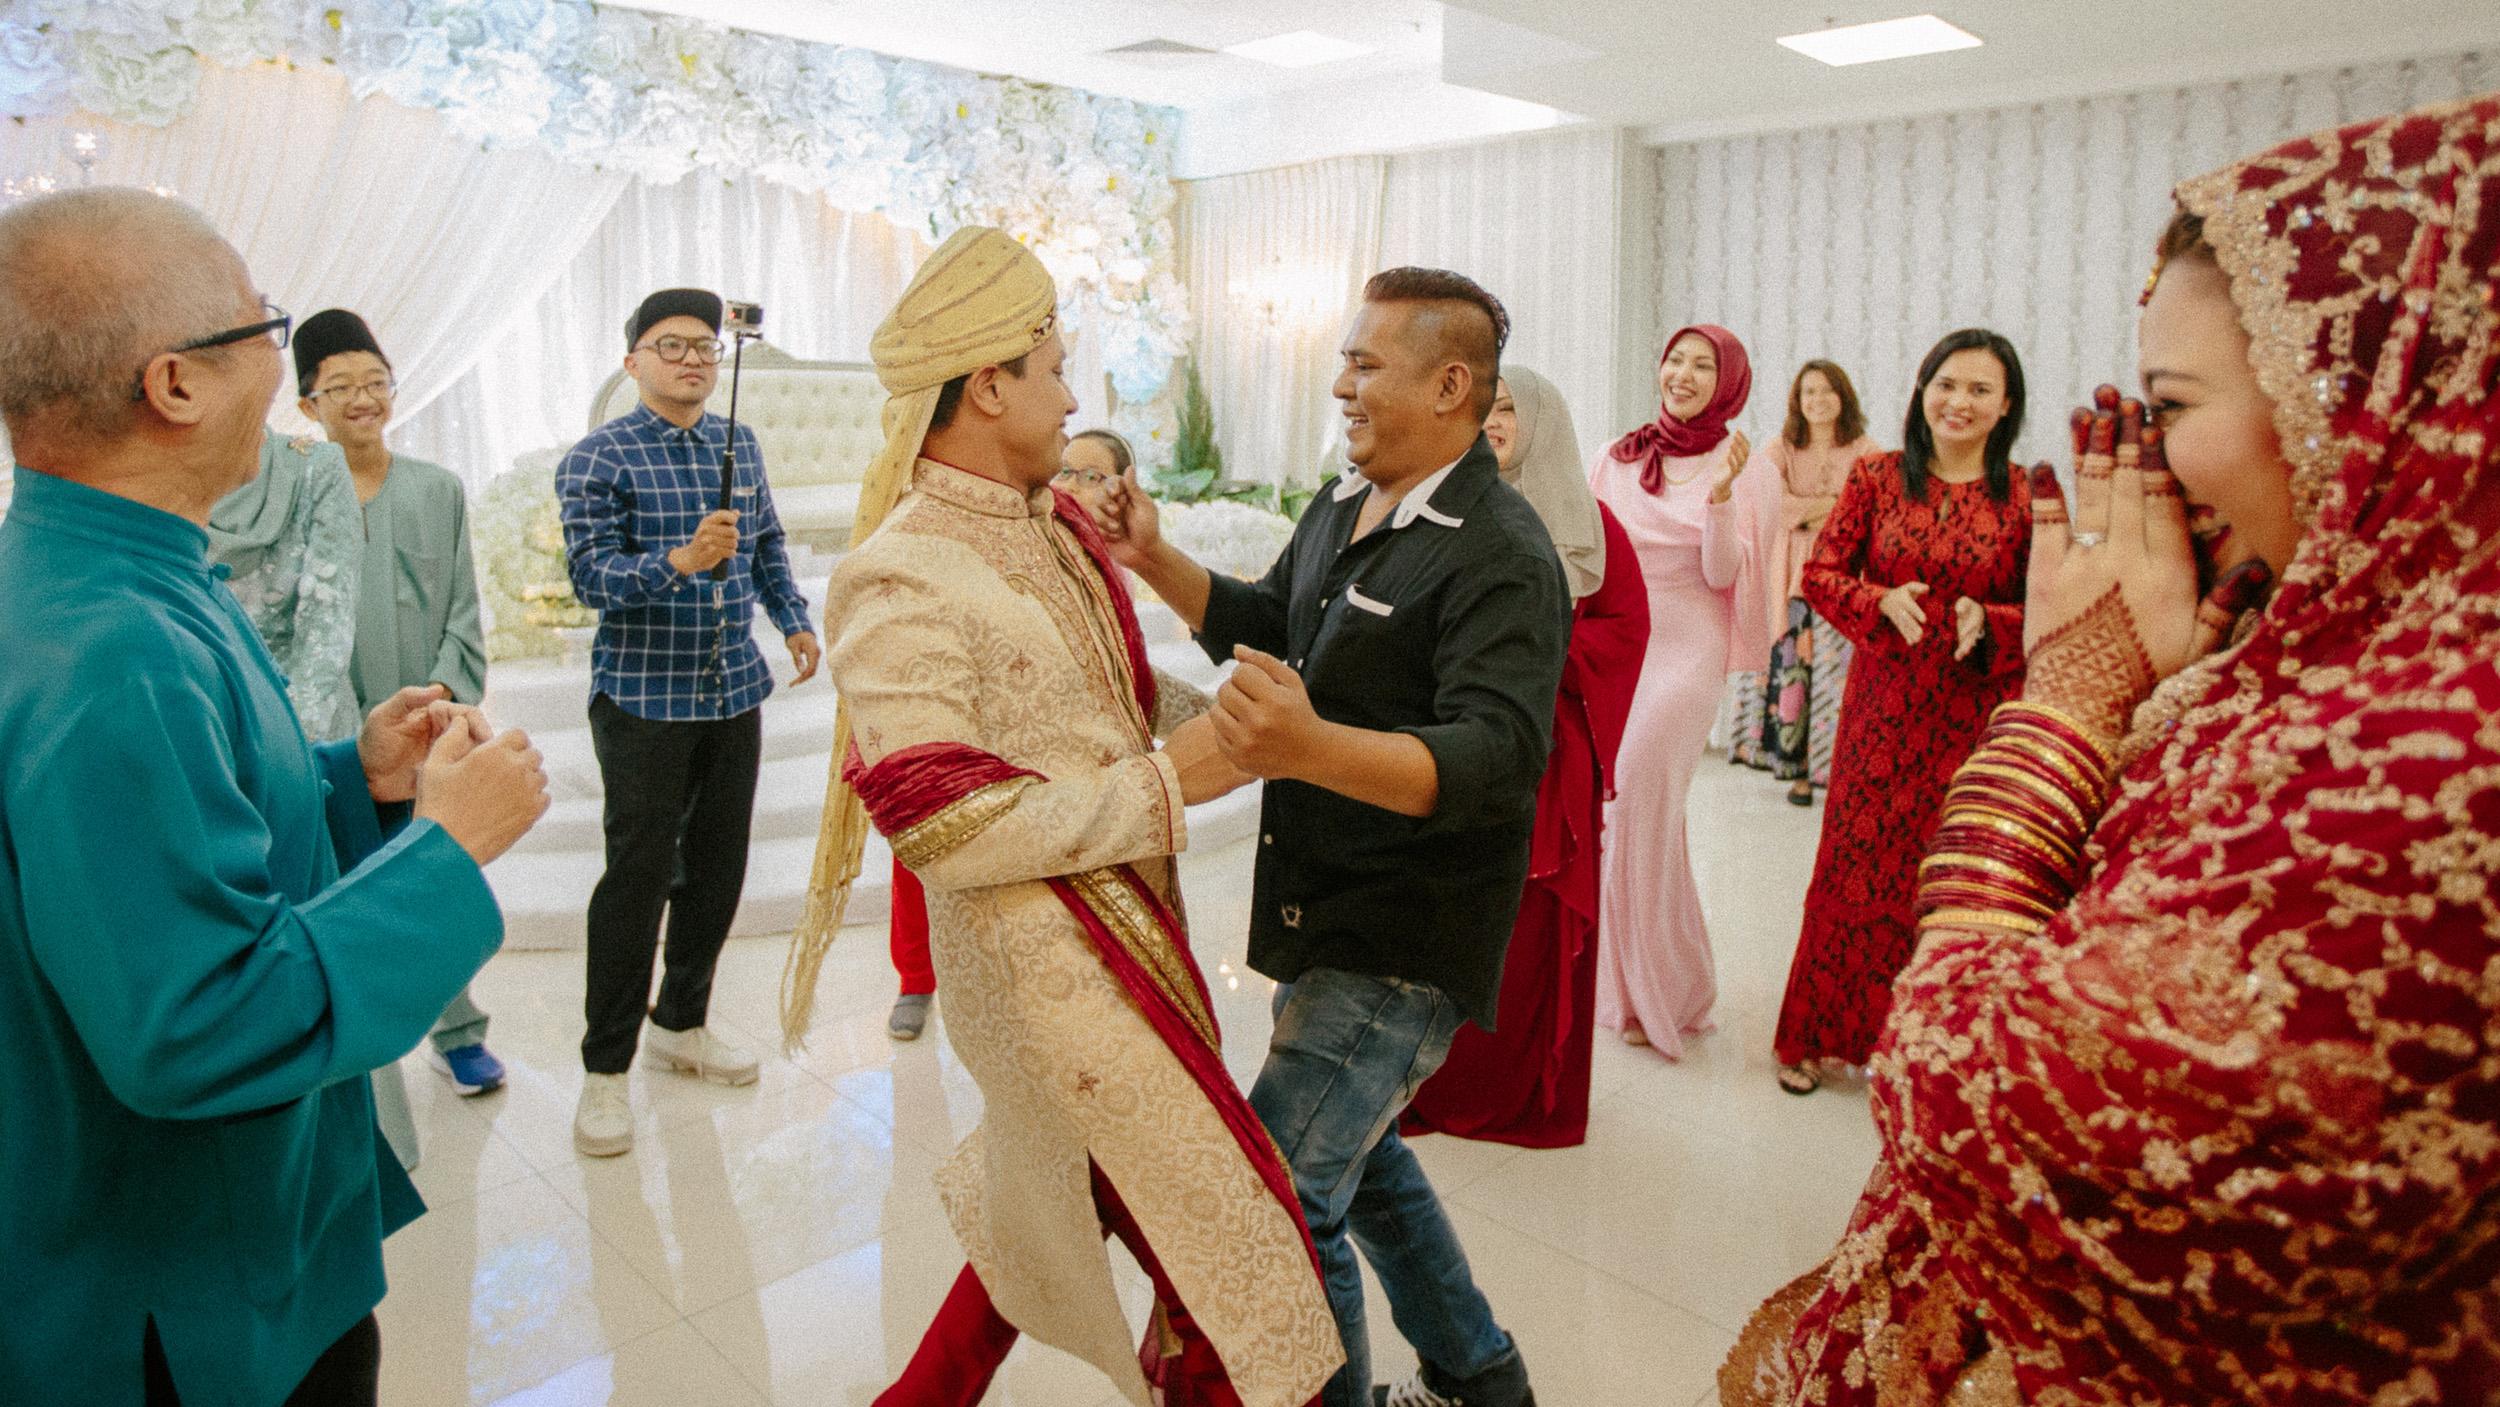 singapore-wedding-photographer-photography-wmt2017-140.jpg